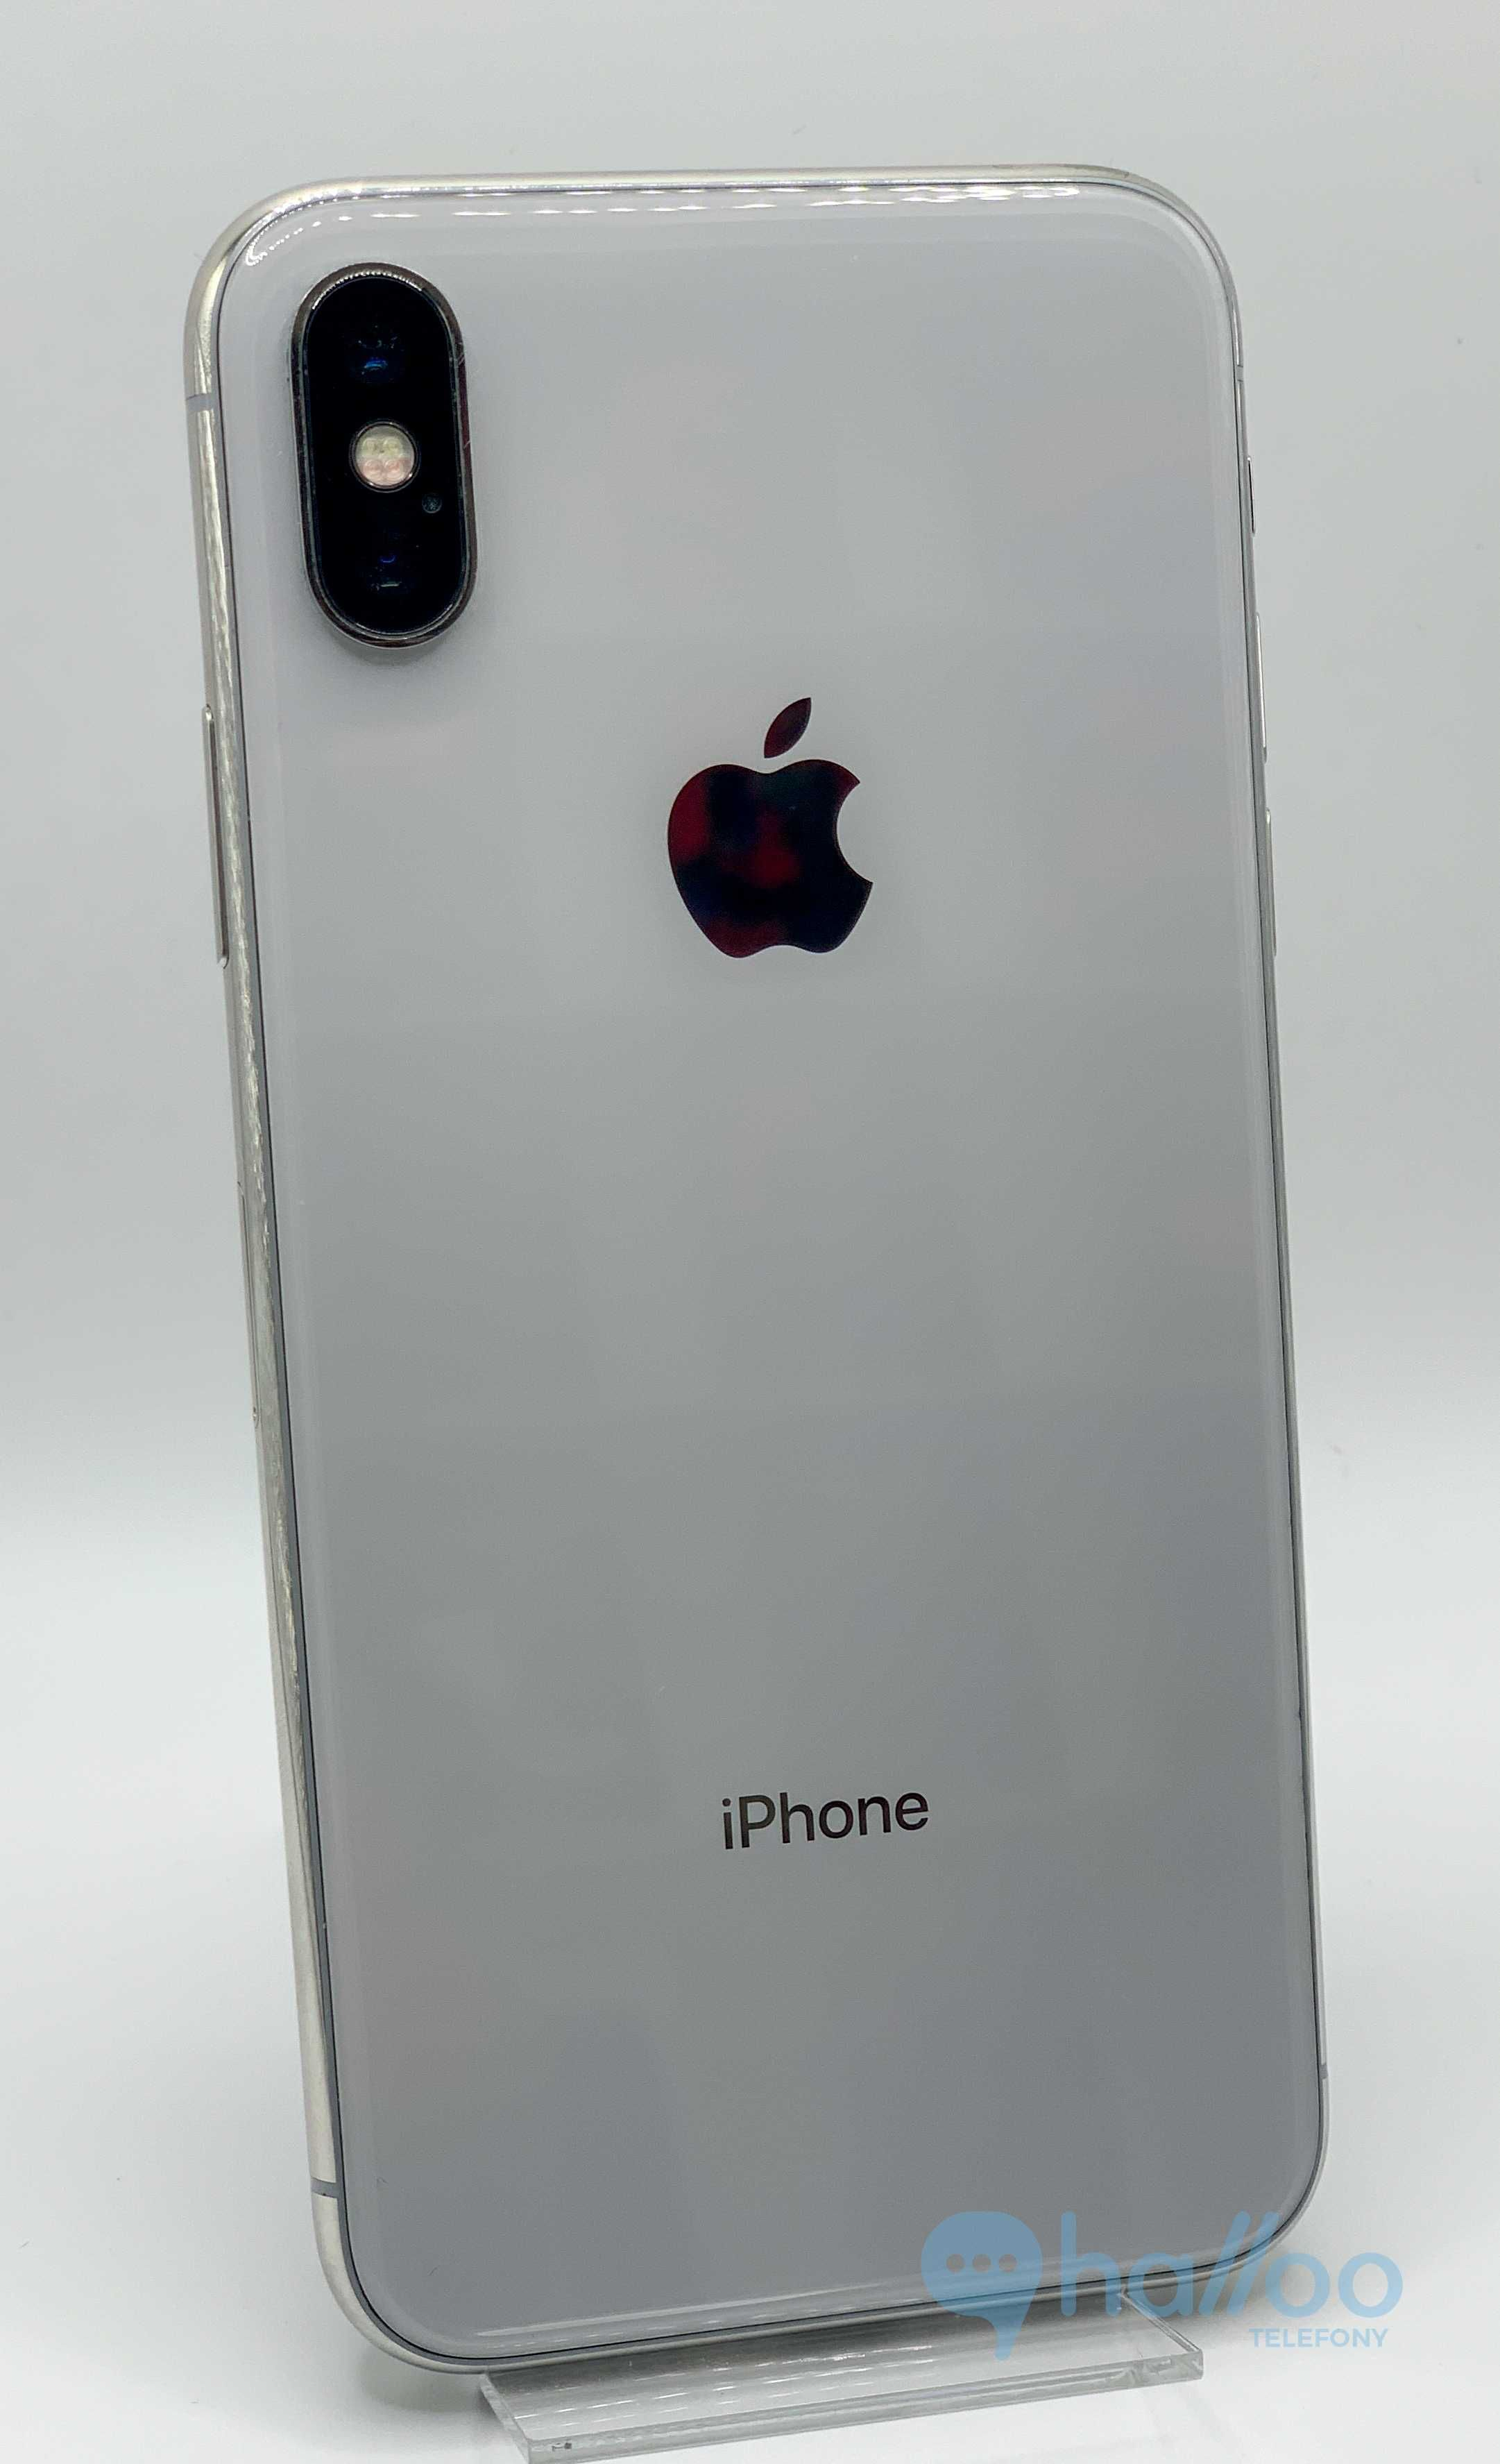 iPhone Xs 64GB Silver | Gwarancja ROK | Gratisy Sklep Halloo Gdynia